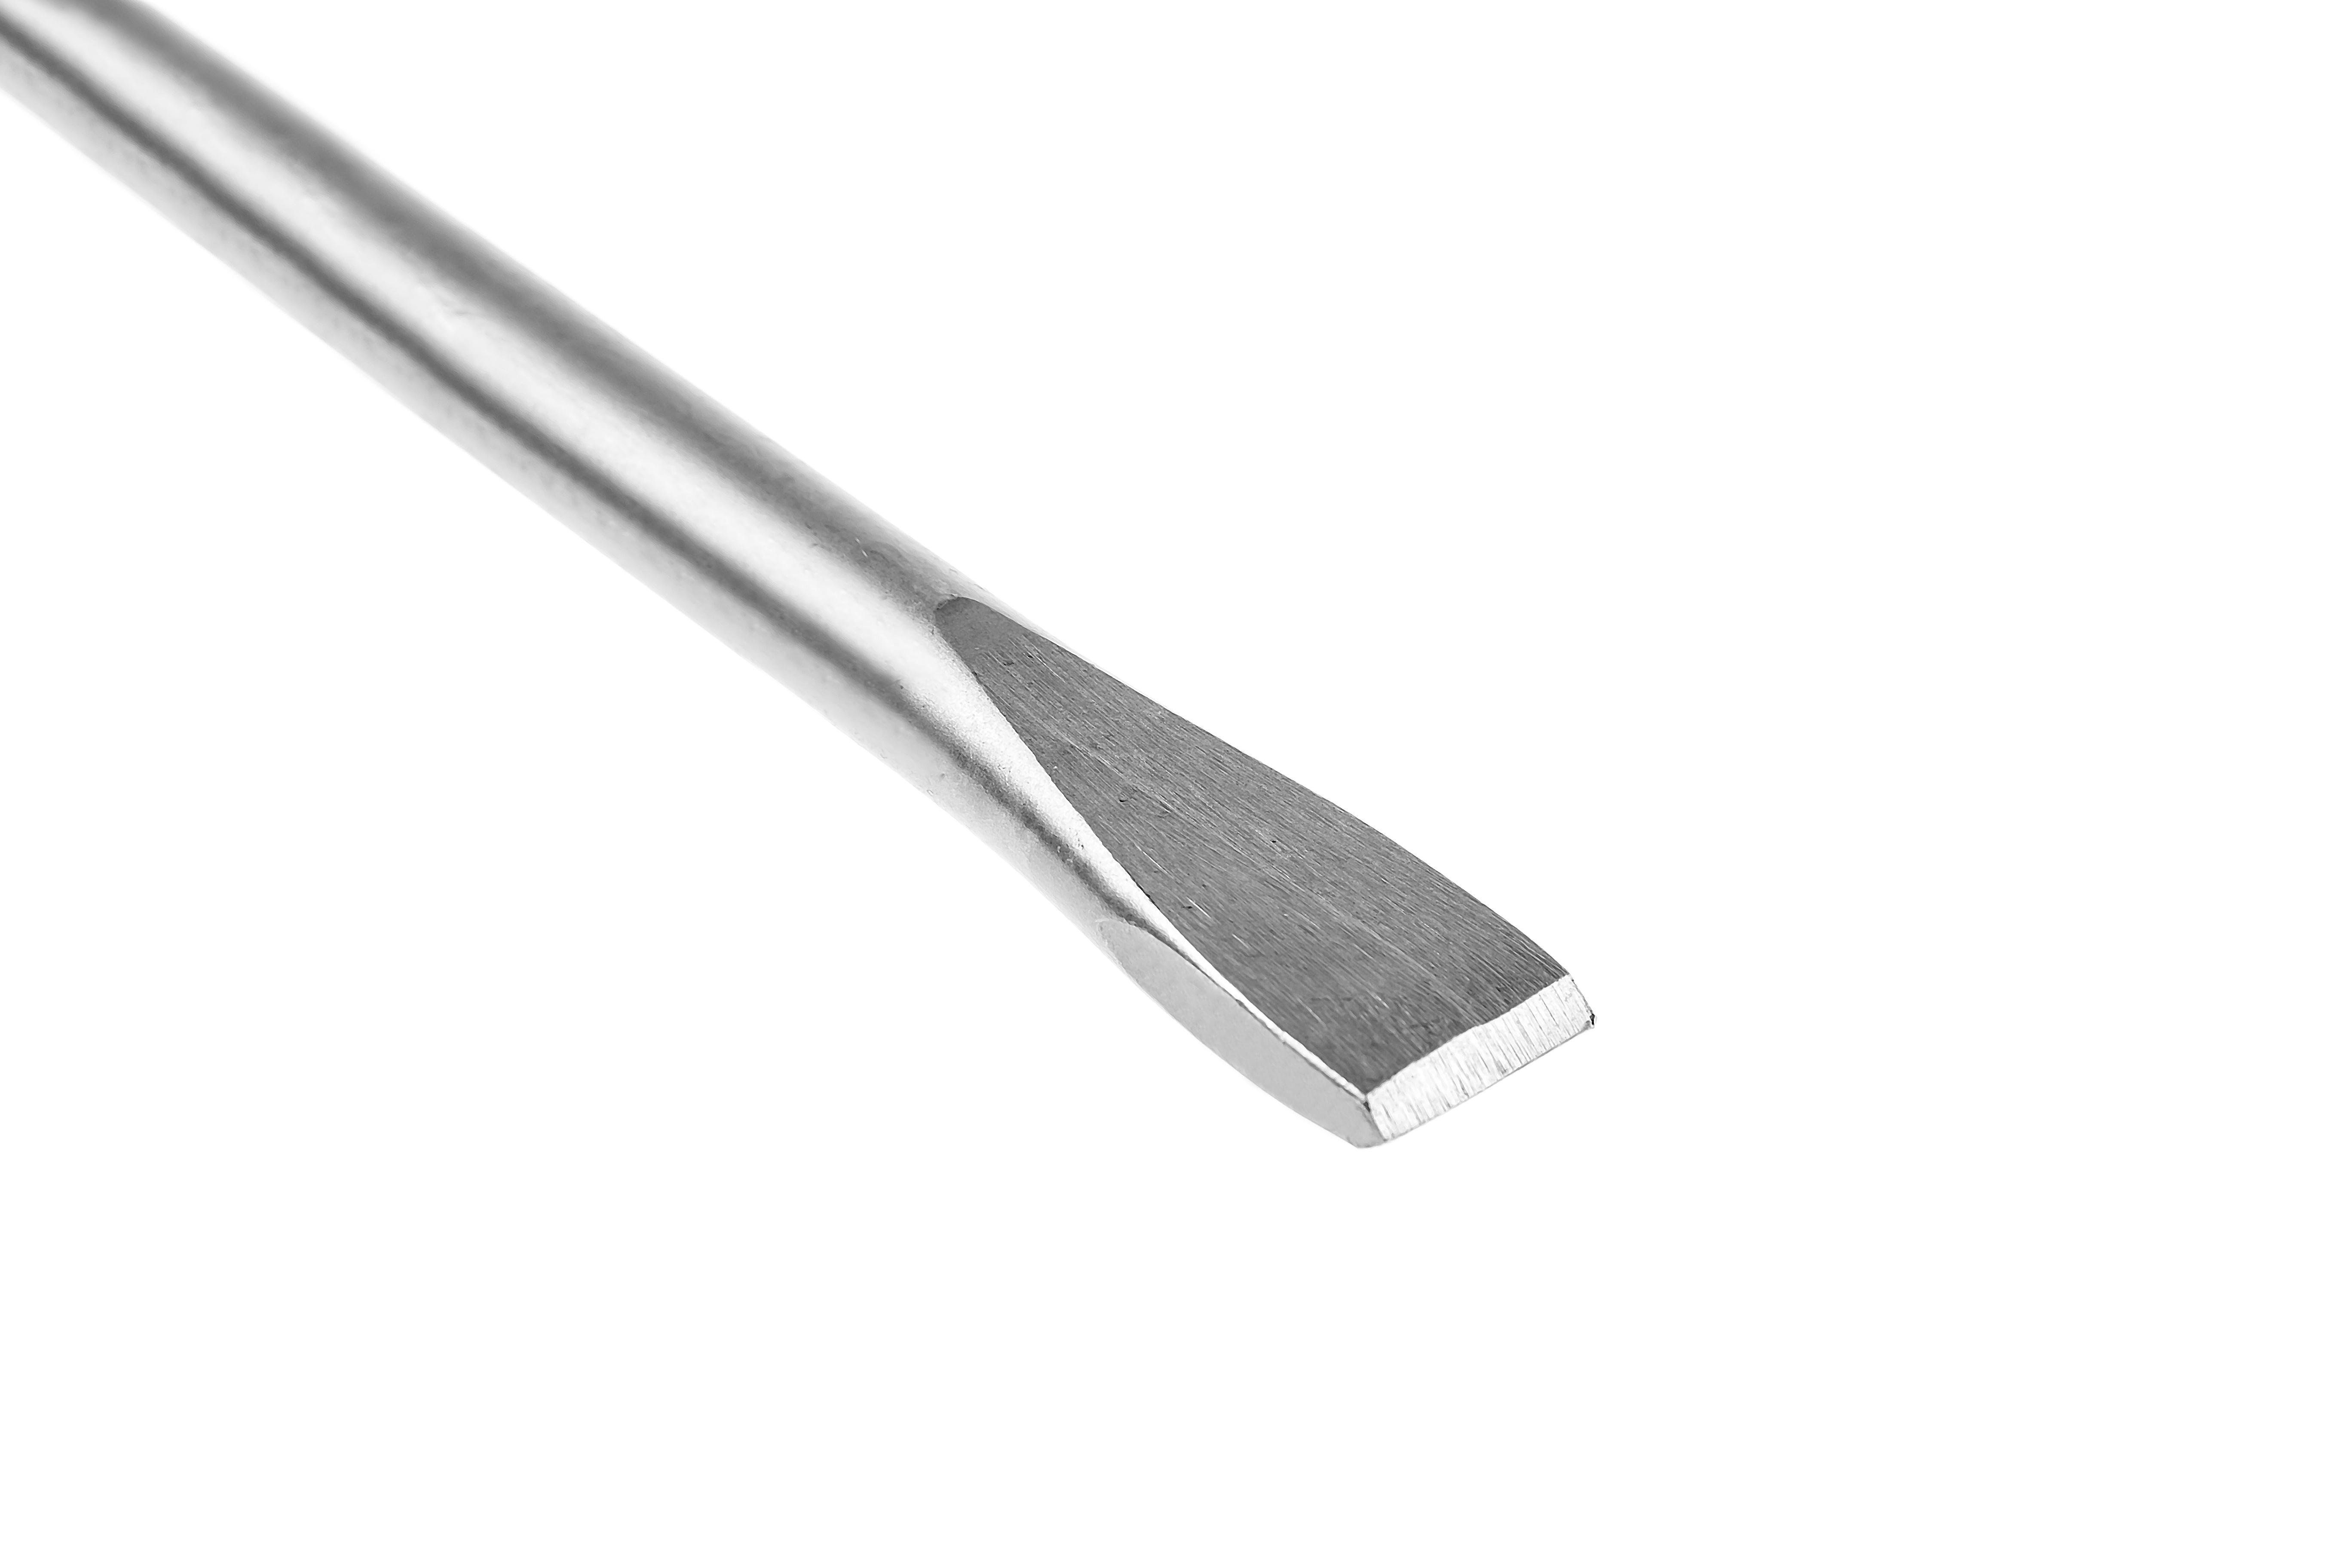 Зубило Hammer Dr ch sds-max плоское 18*400*25мм зубило sds plus hammer плоское 40х250мм